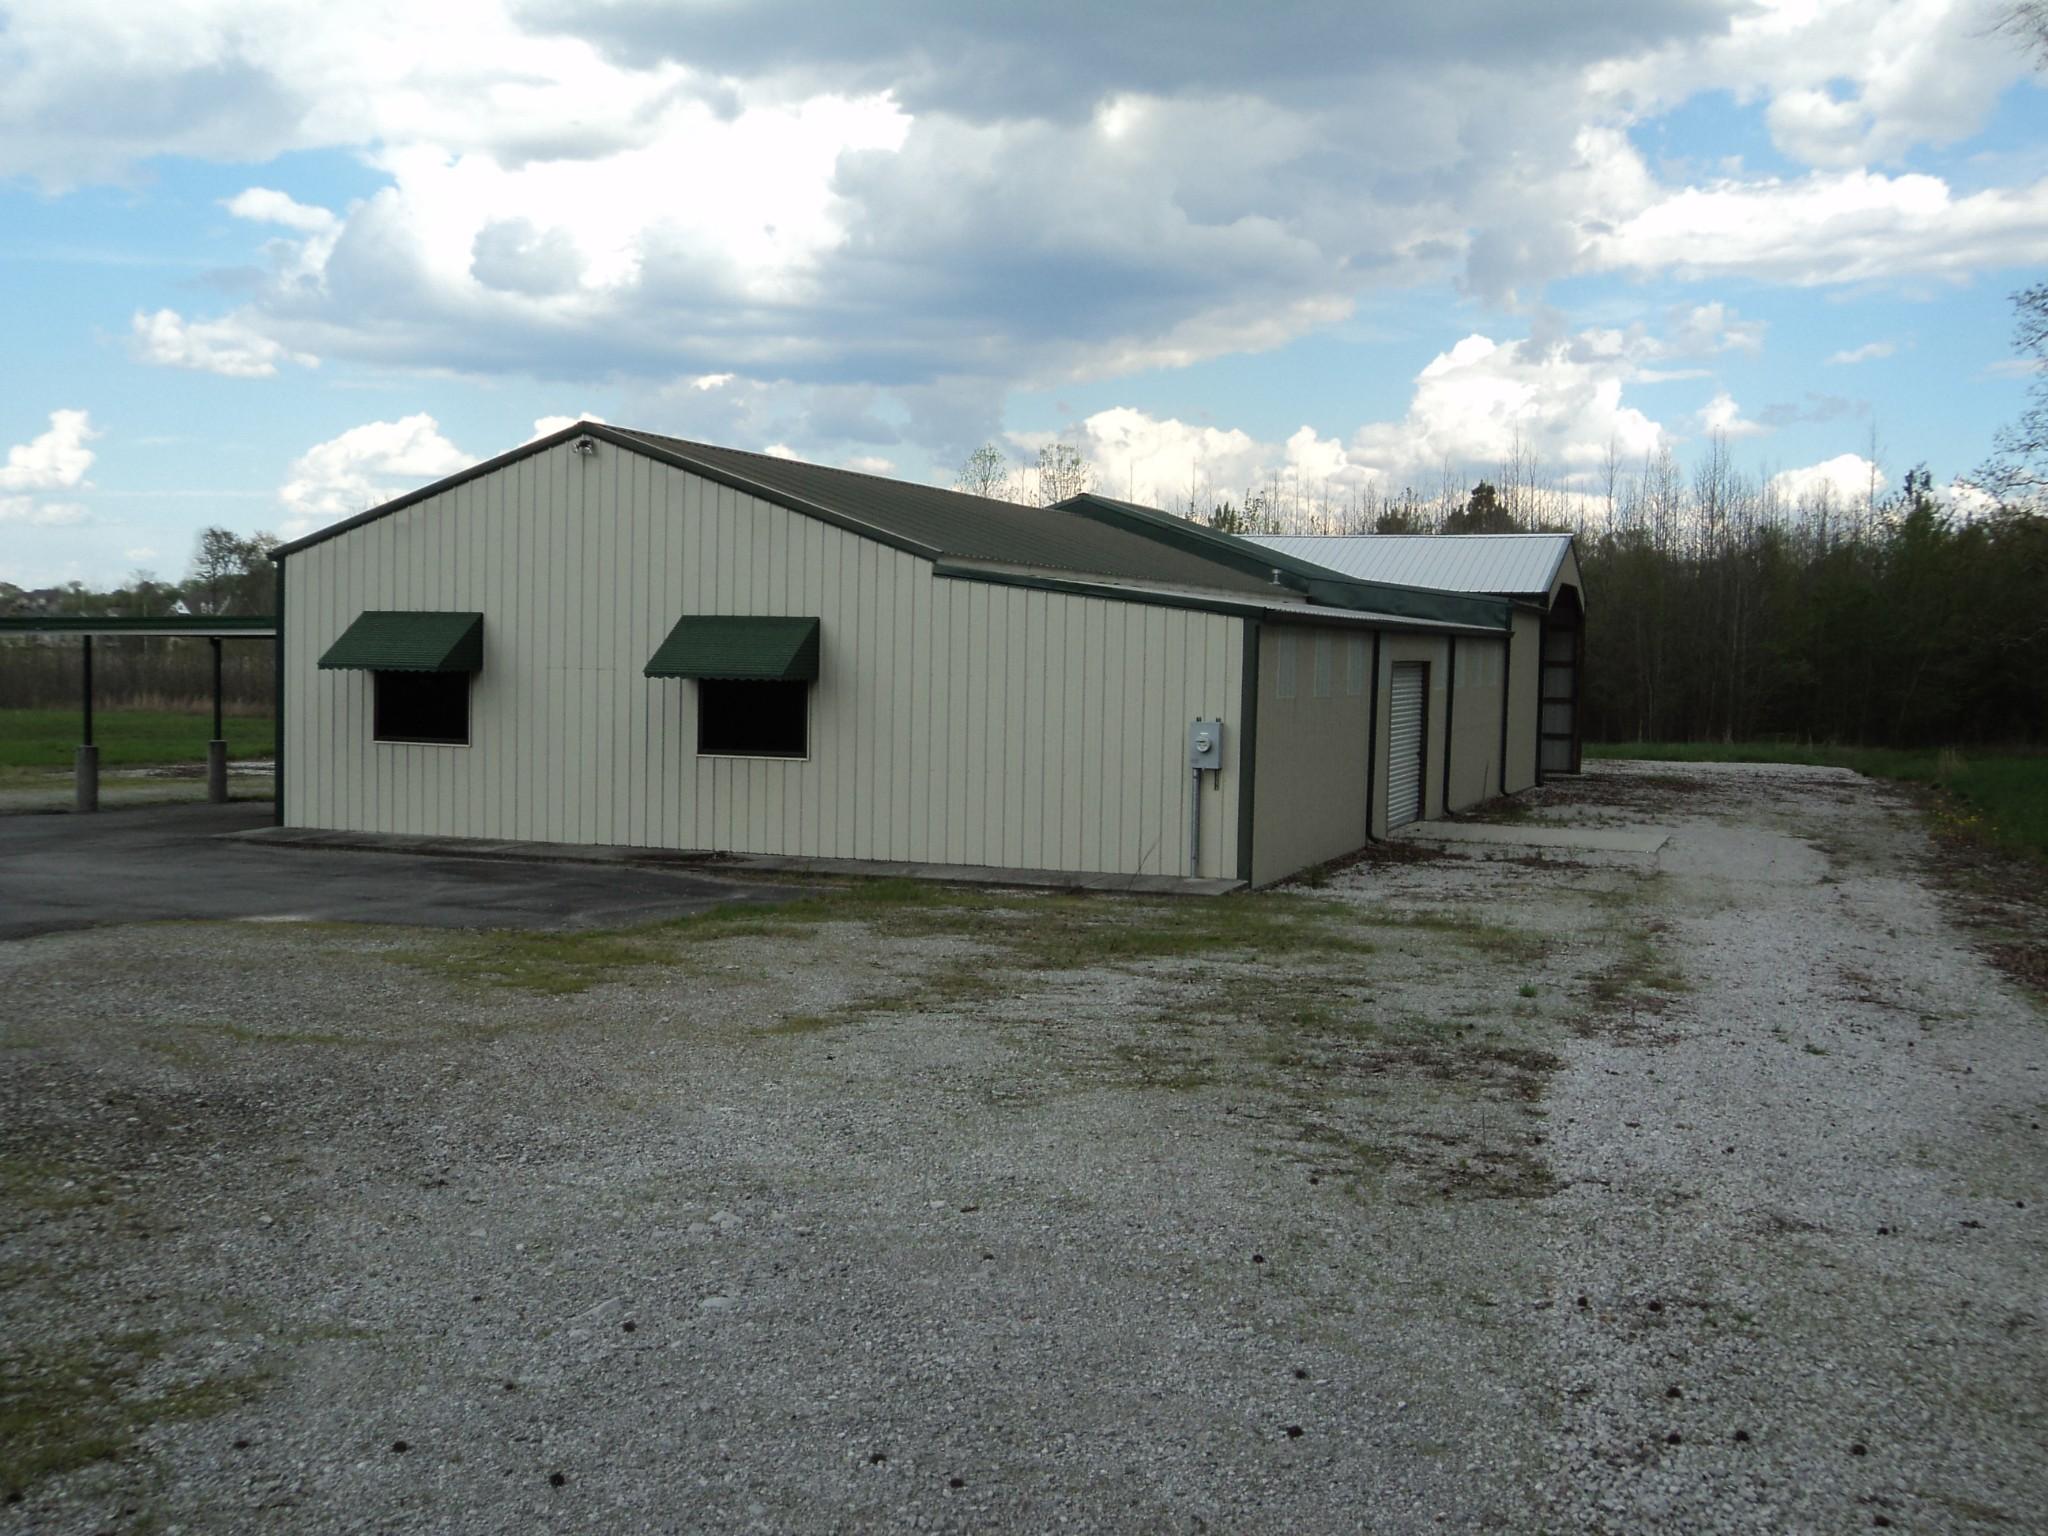 793 Aedc RD Property Photo - Hillsboro, TN real estate listing